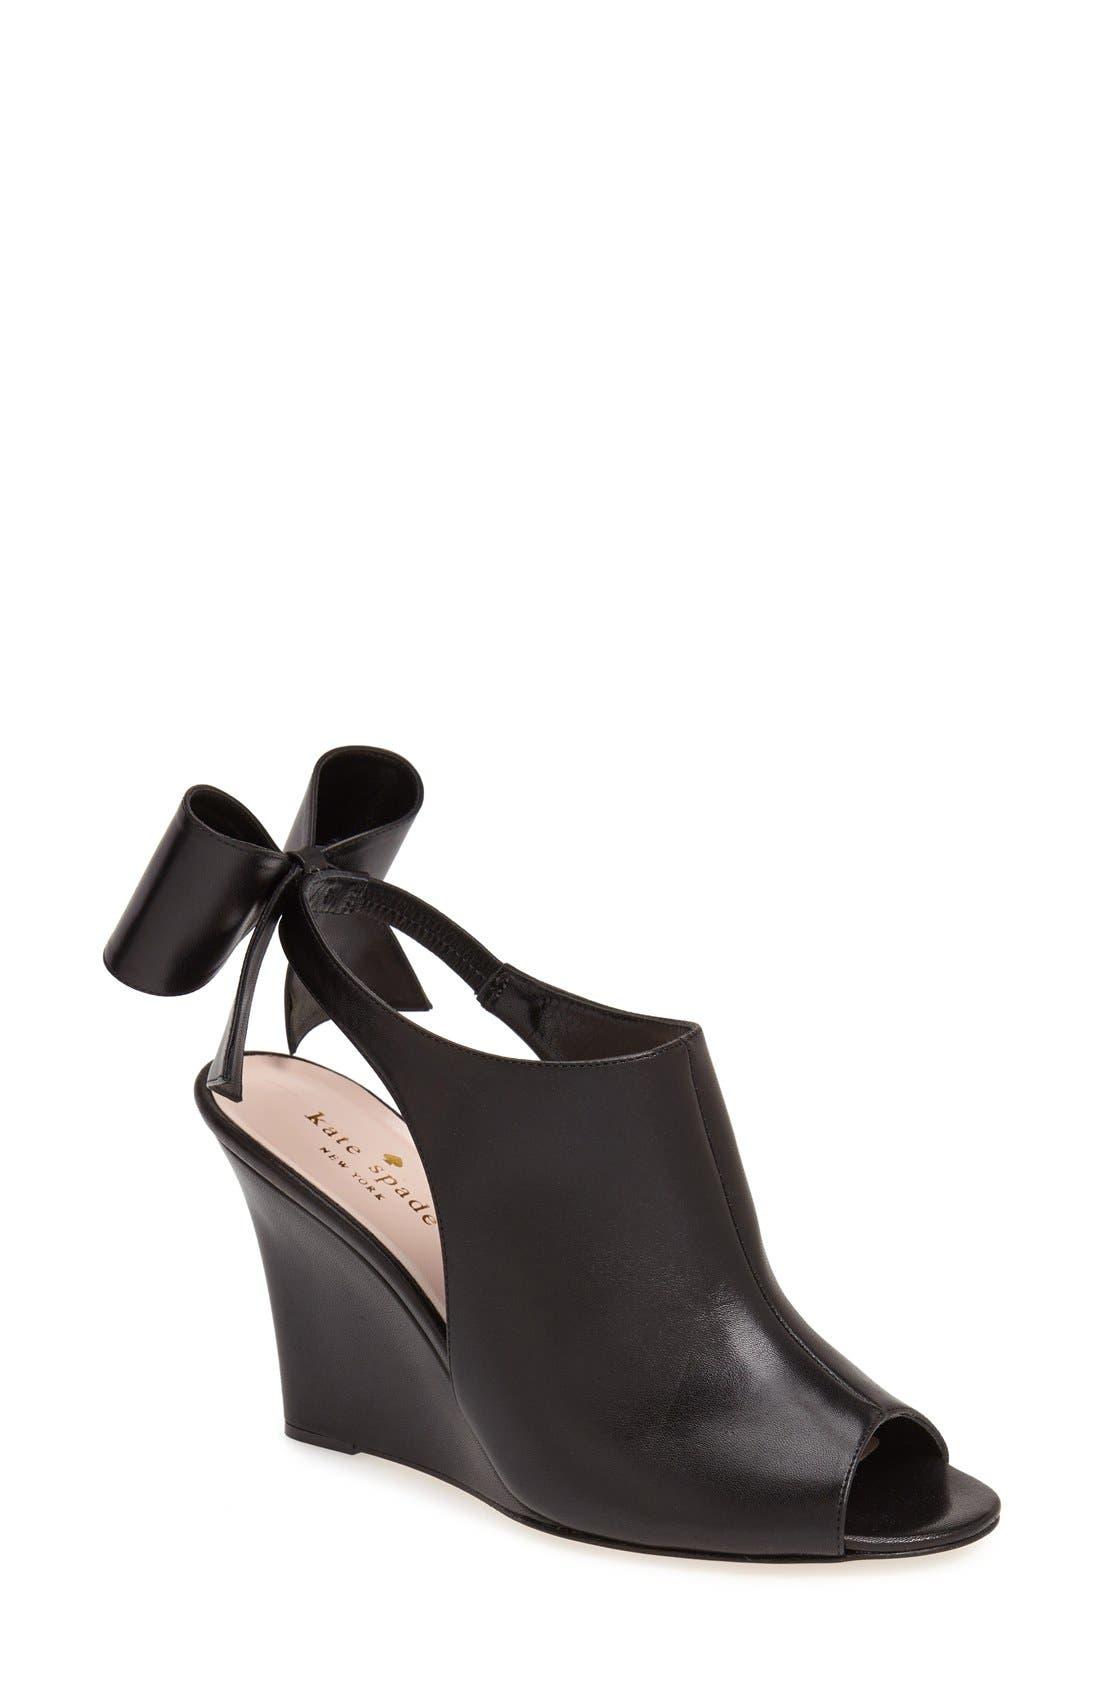 Alternate Image 1 Selected - kate spade new york 'ira' slingback sandal (Women)